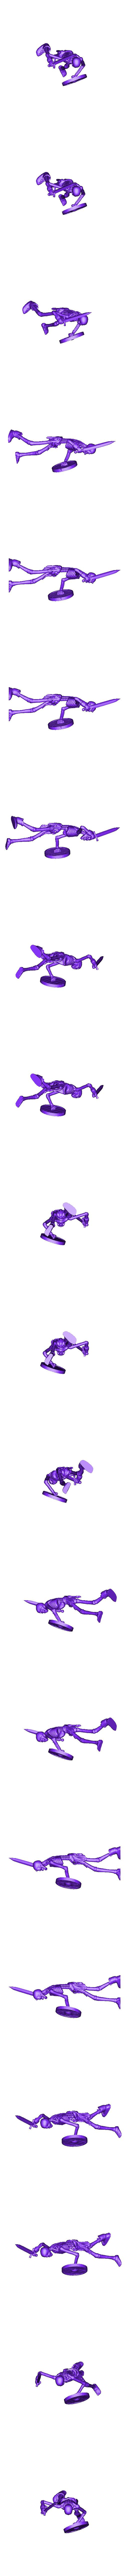 SkeletonWarrior1V2_SOLID.stl Download STL file Sekeltons - 28mm D&D Miniatures  • 3D printing template, pyrokahd